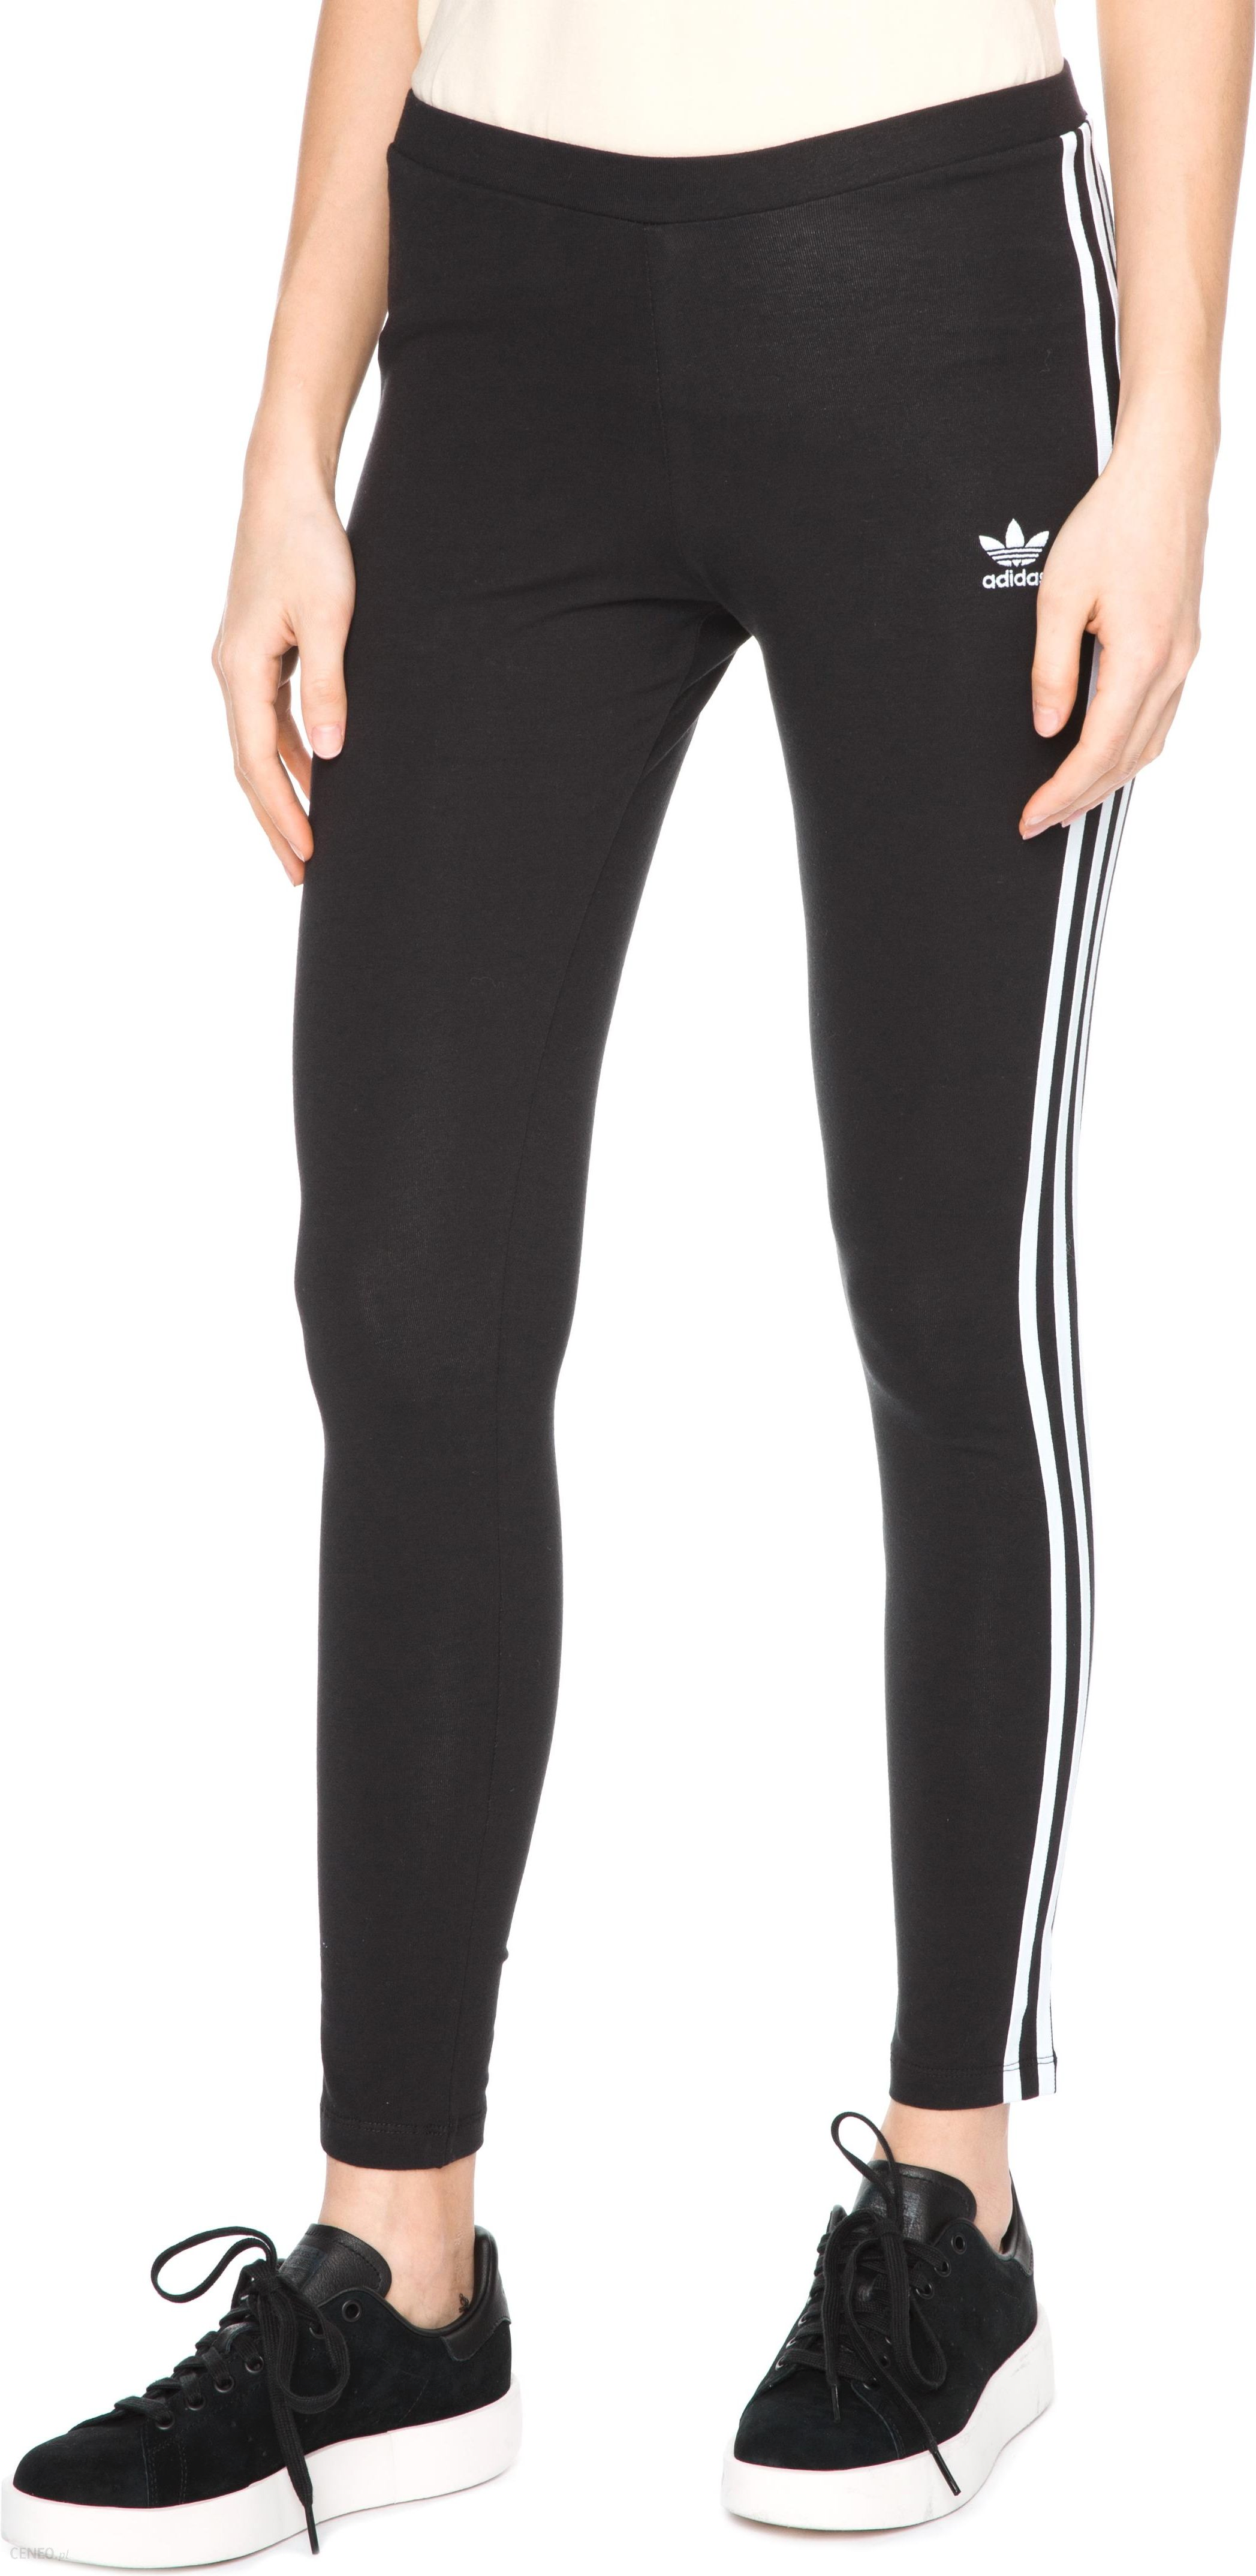 Adidas Originals Legginsy Spodnie Damskie 40 Ceny i opinie Ceneo.pl